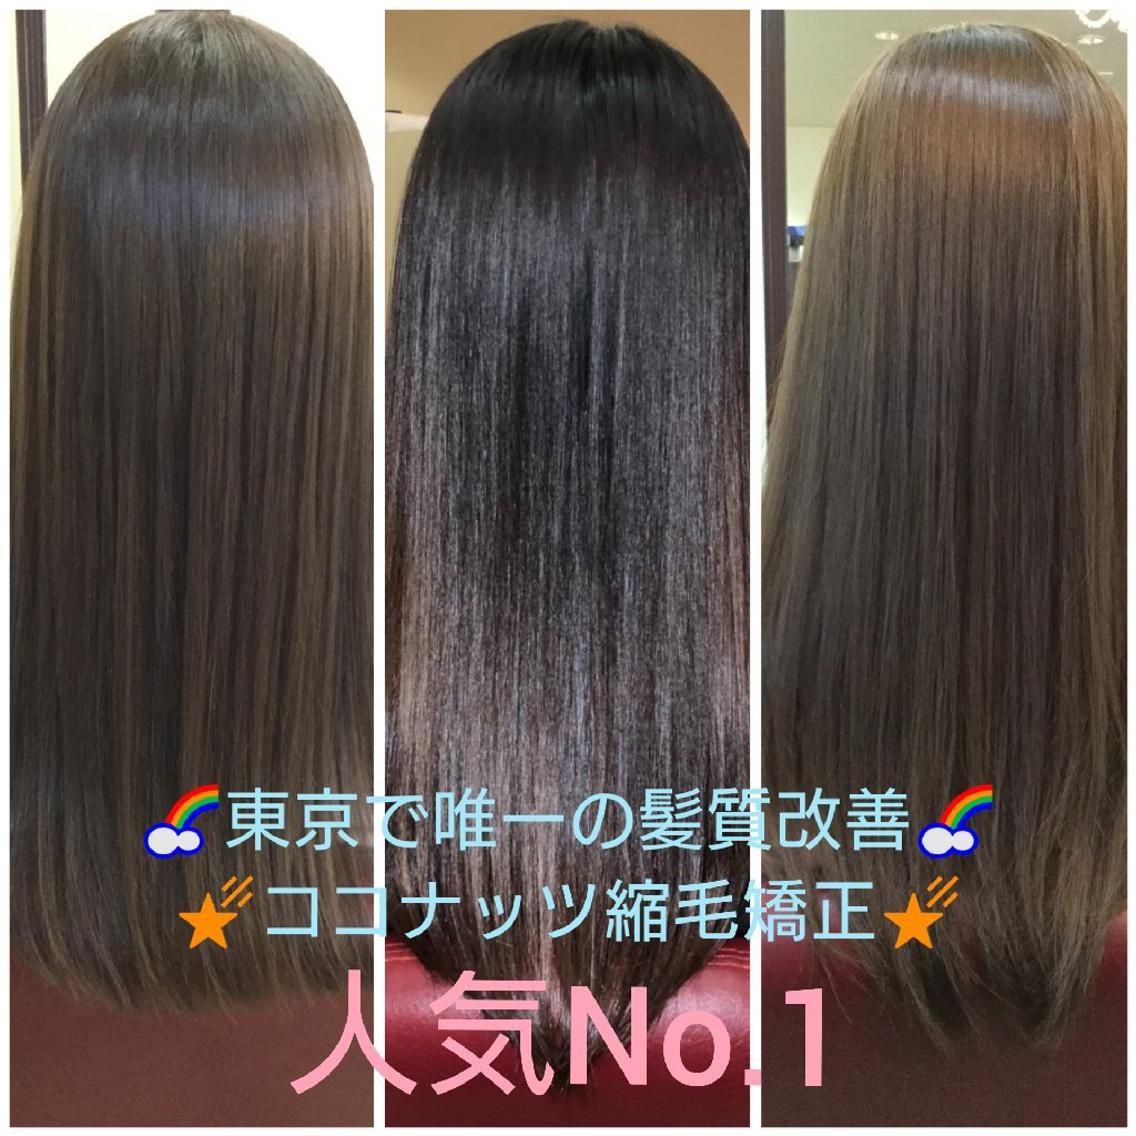 seed hair make所属・榎本 眞一の掲載